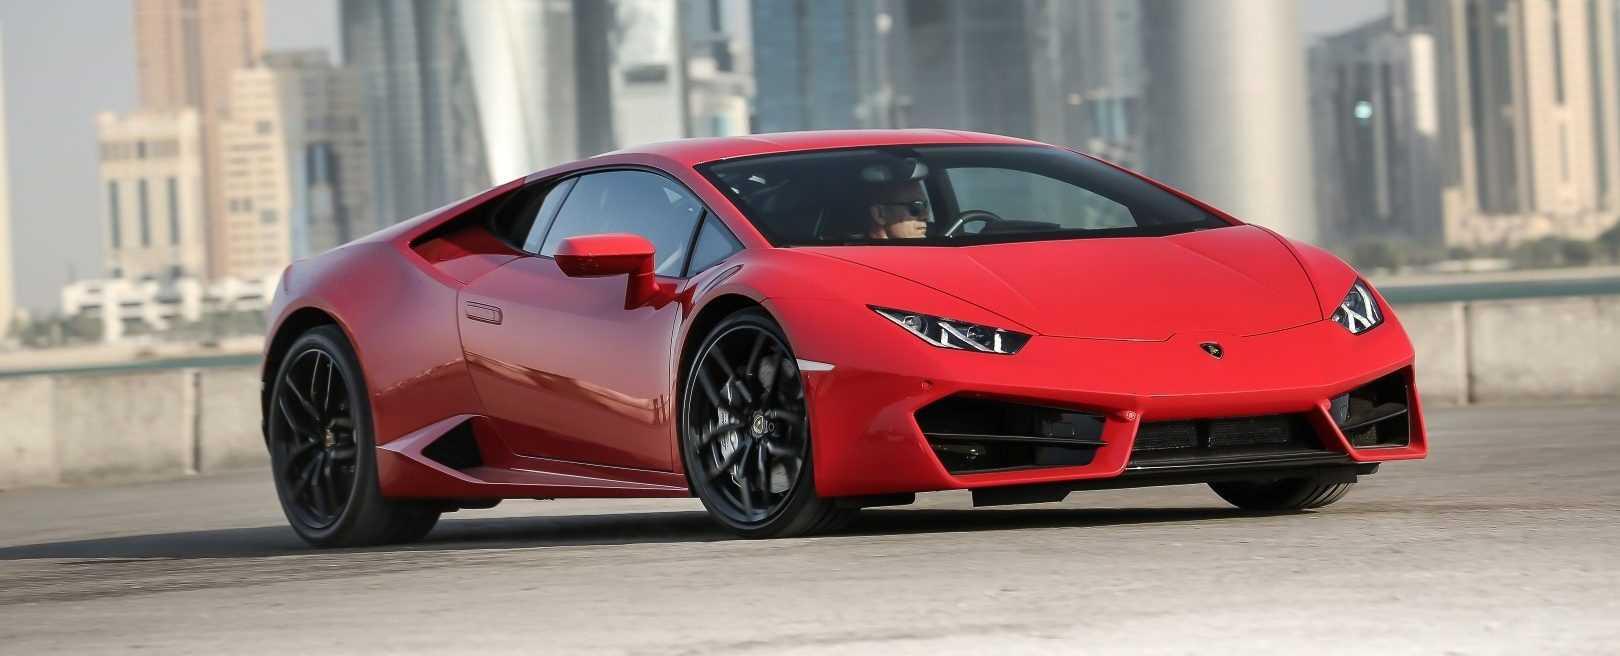 Lamborghini Huracán RWD Coupé 2016